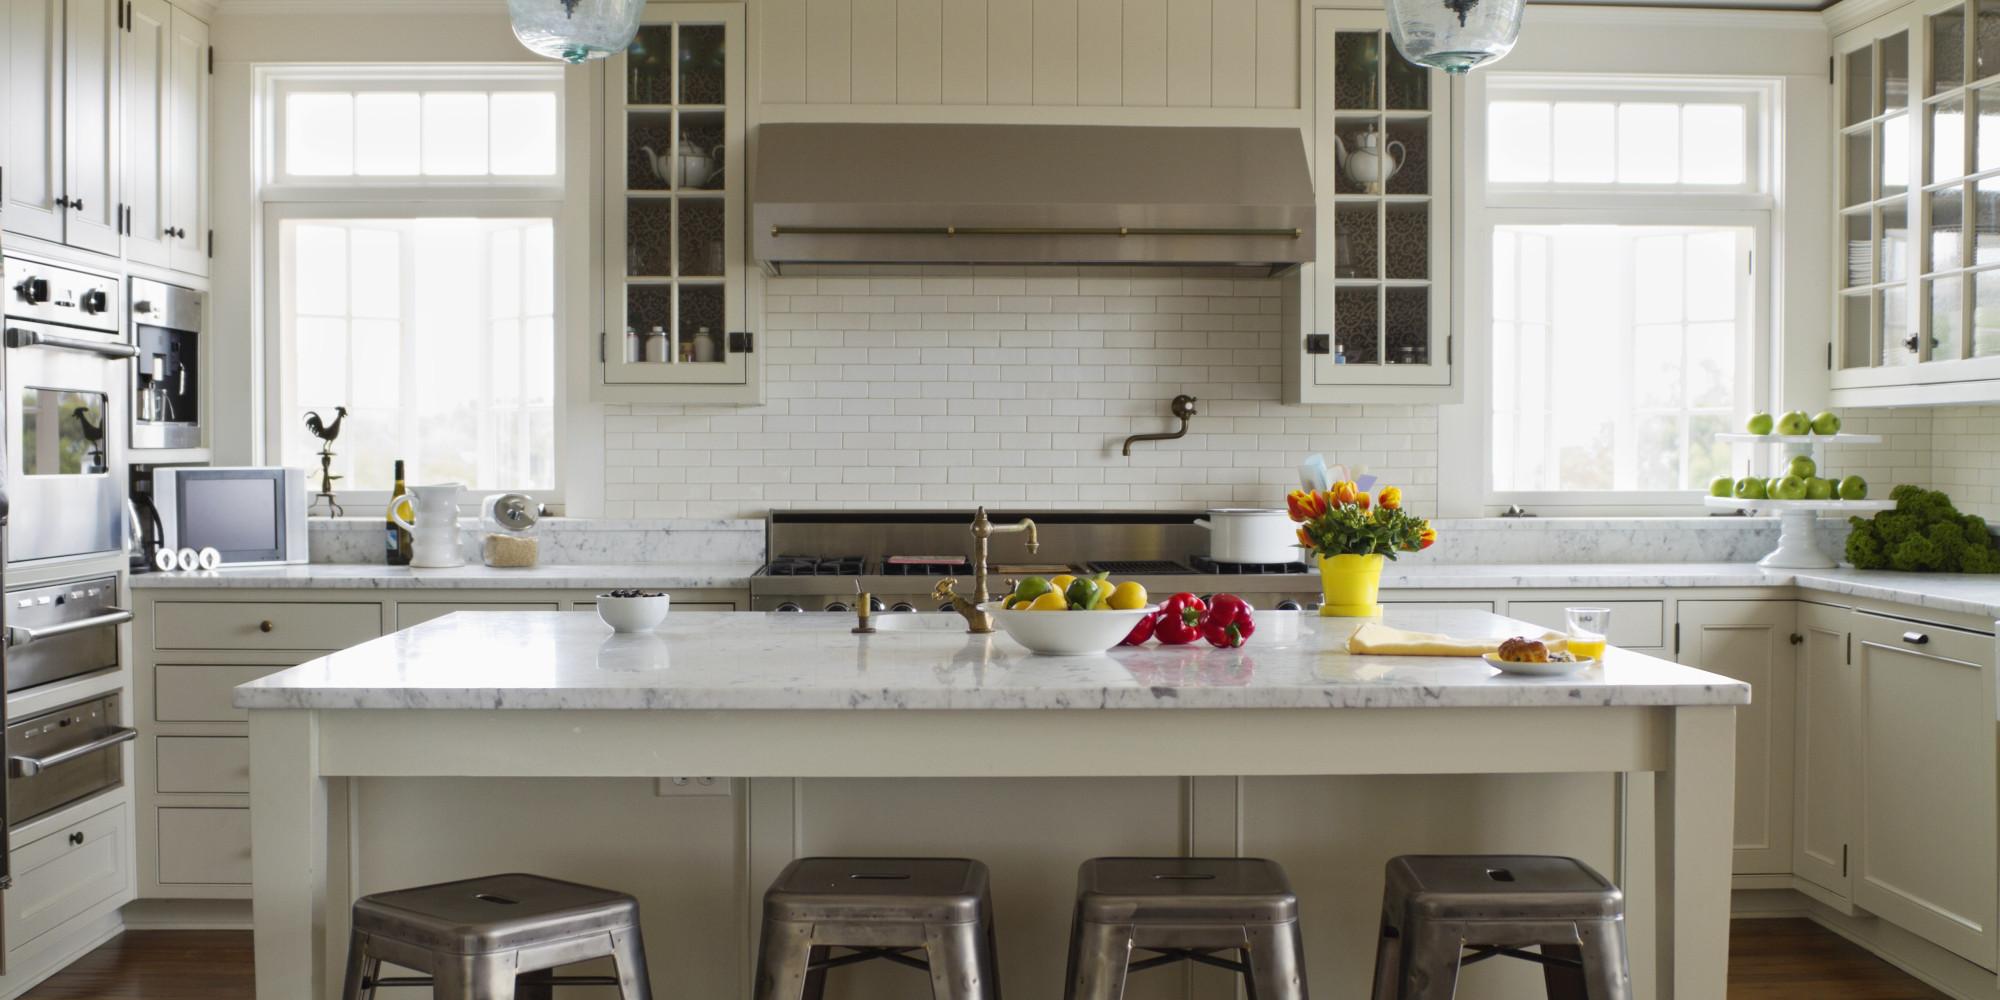 New Designs Kitchens Classic Simple Designs Kitchen Cabinet L Type Small Kitchen Design